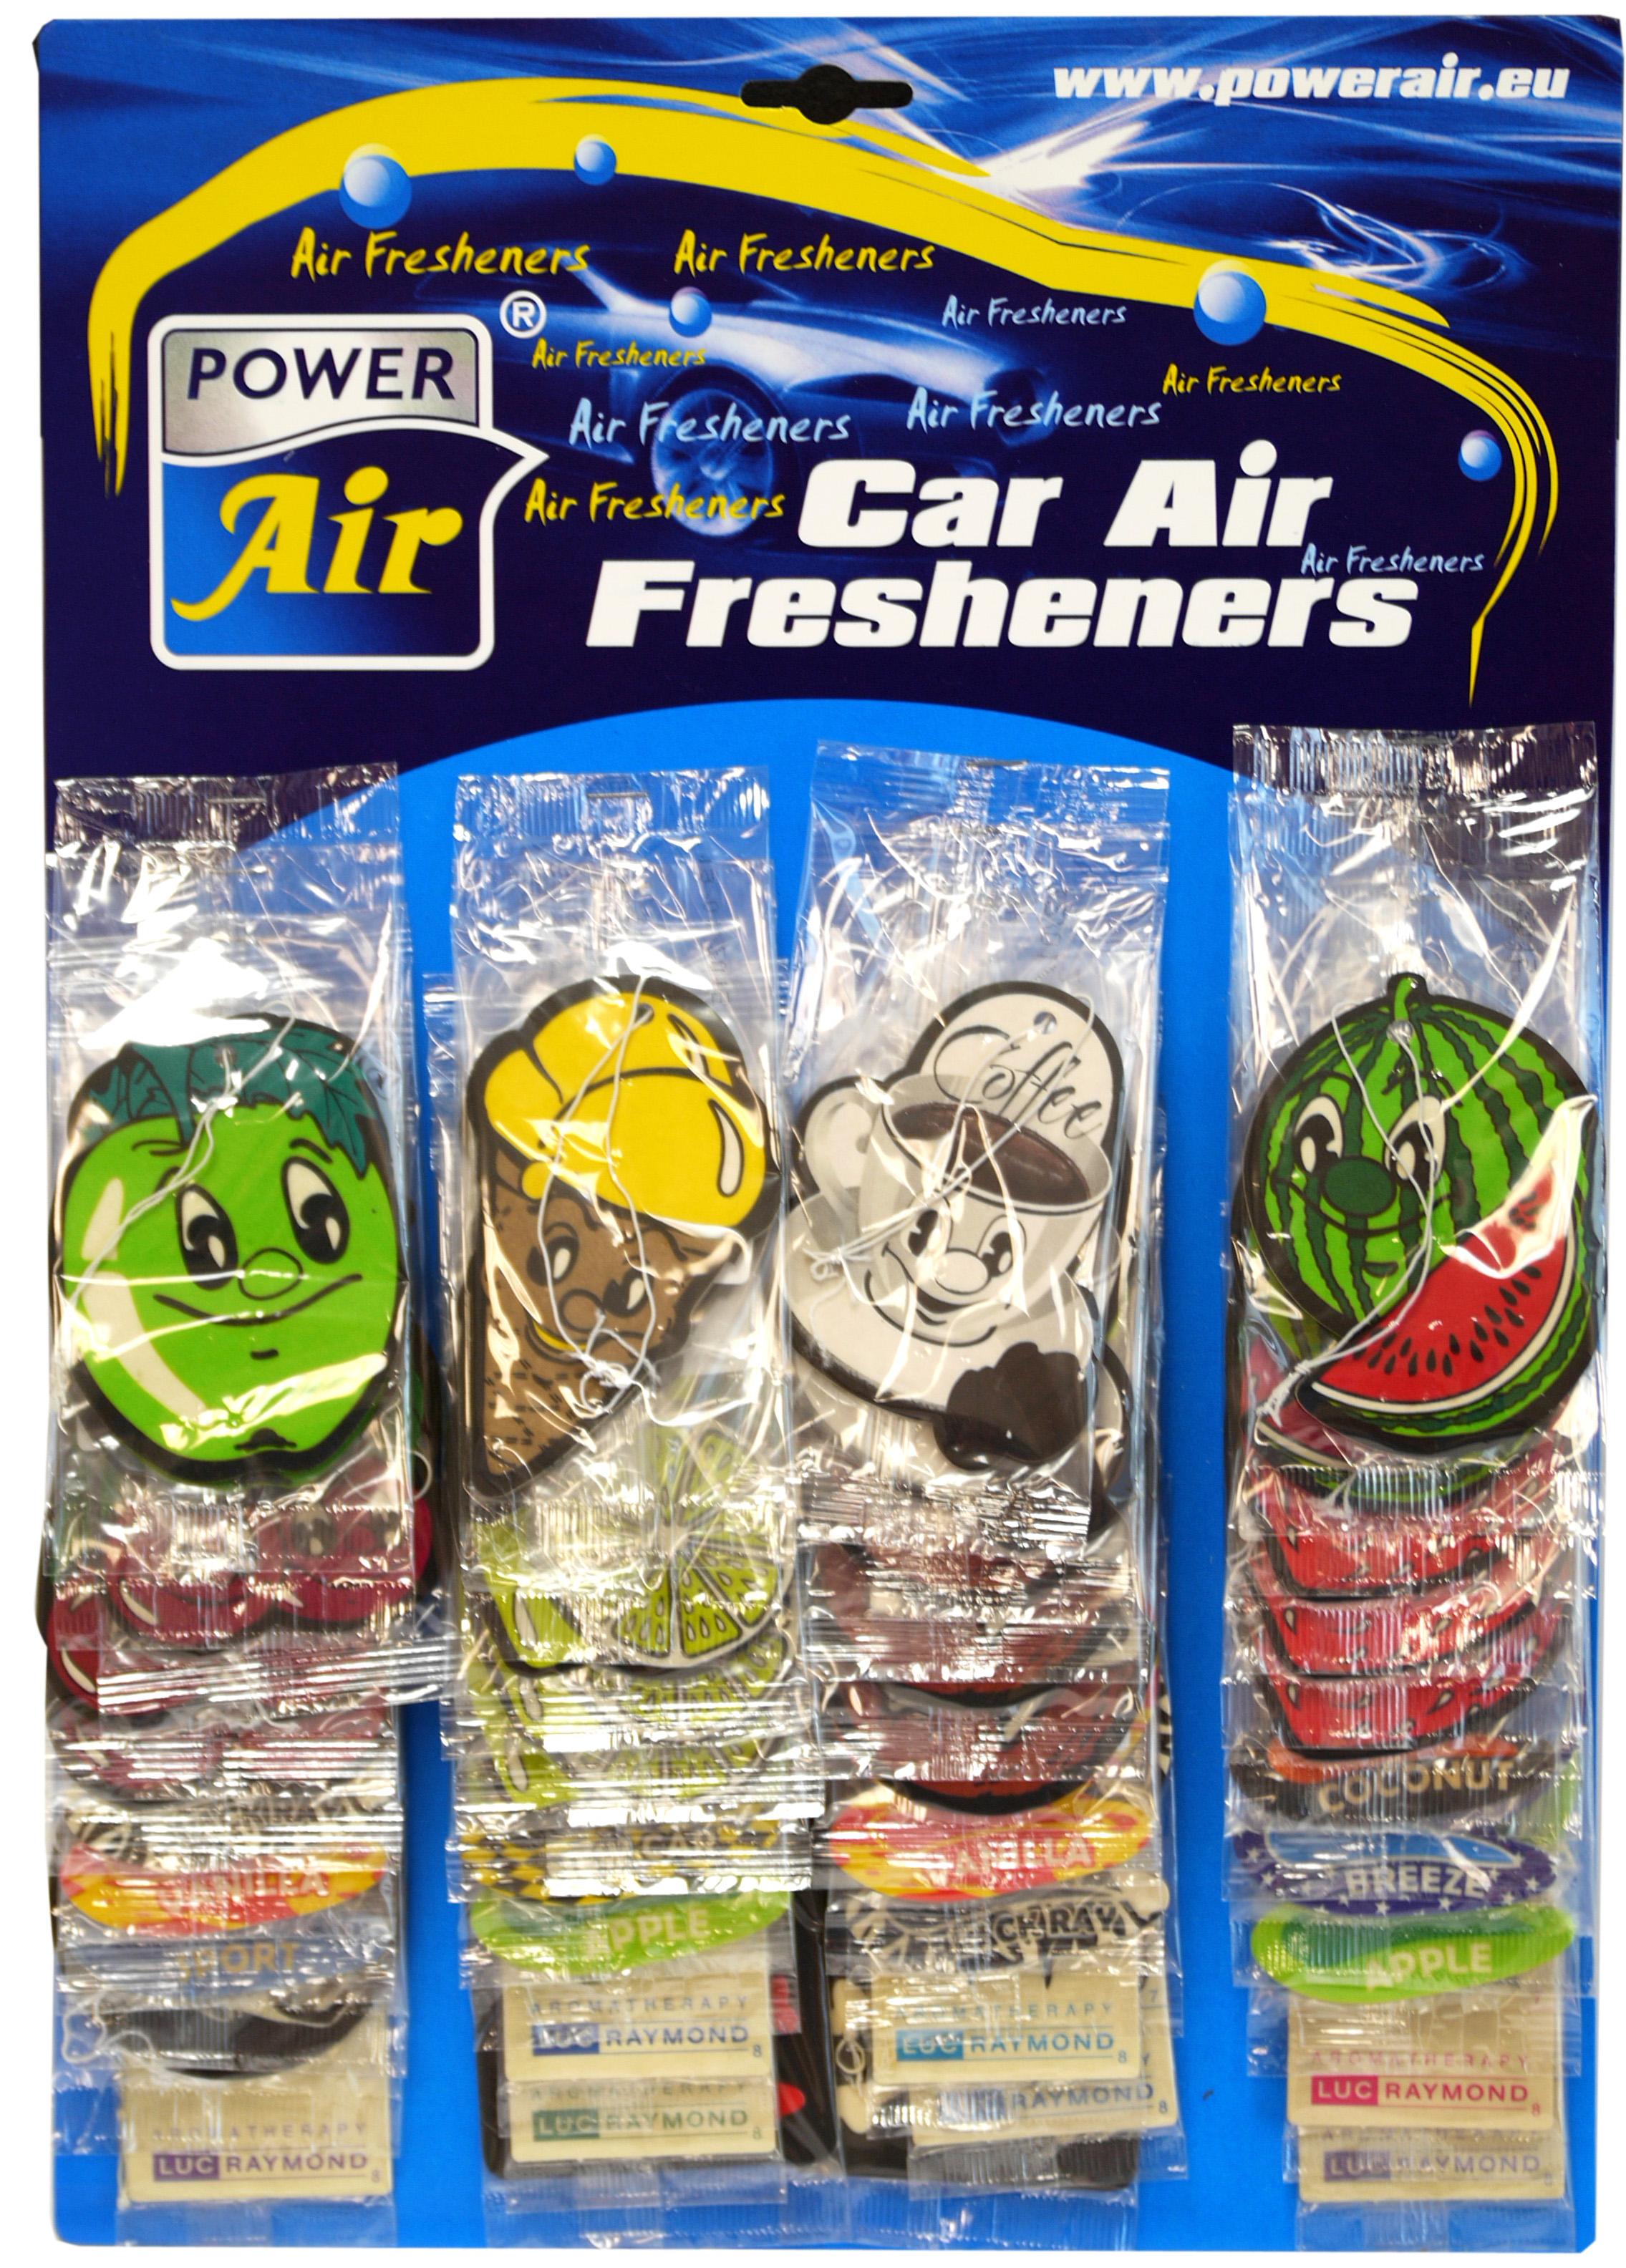 00526 - Auto Lufterfrischer Duftblätter Tafel 40 Stück